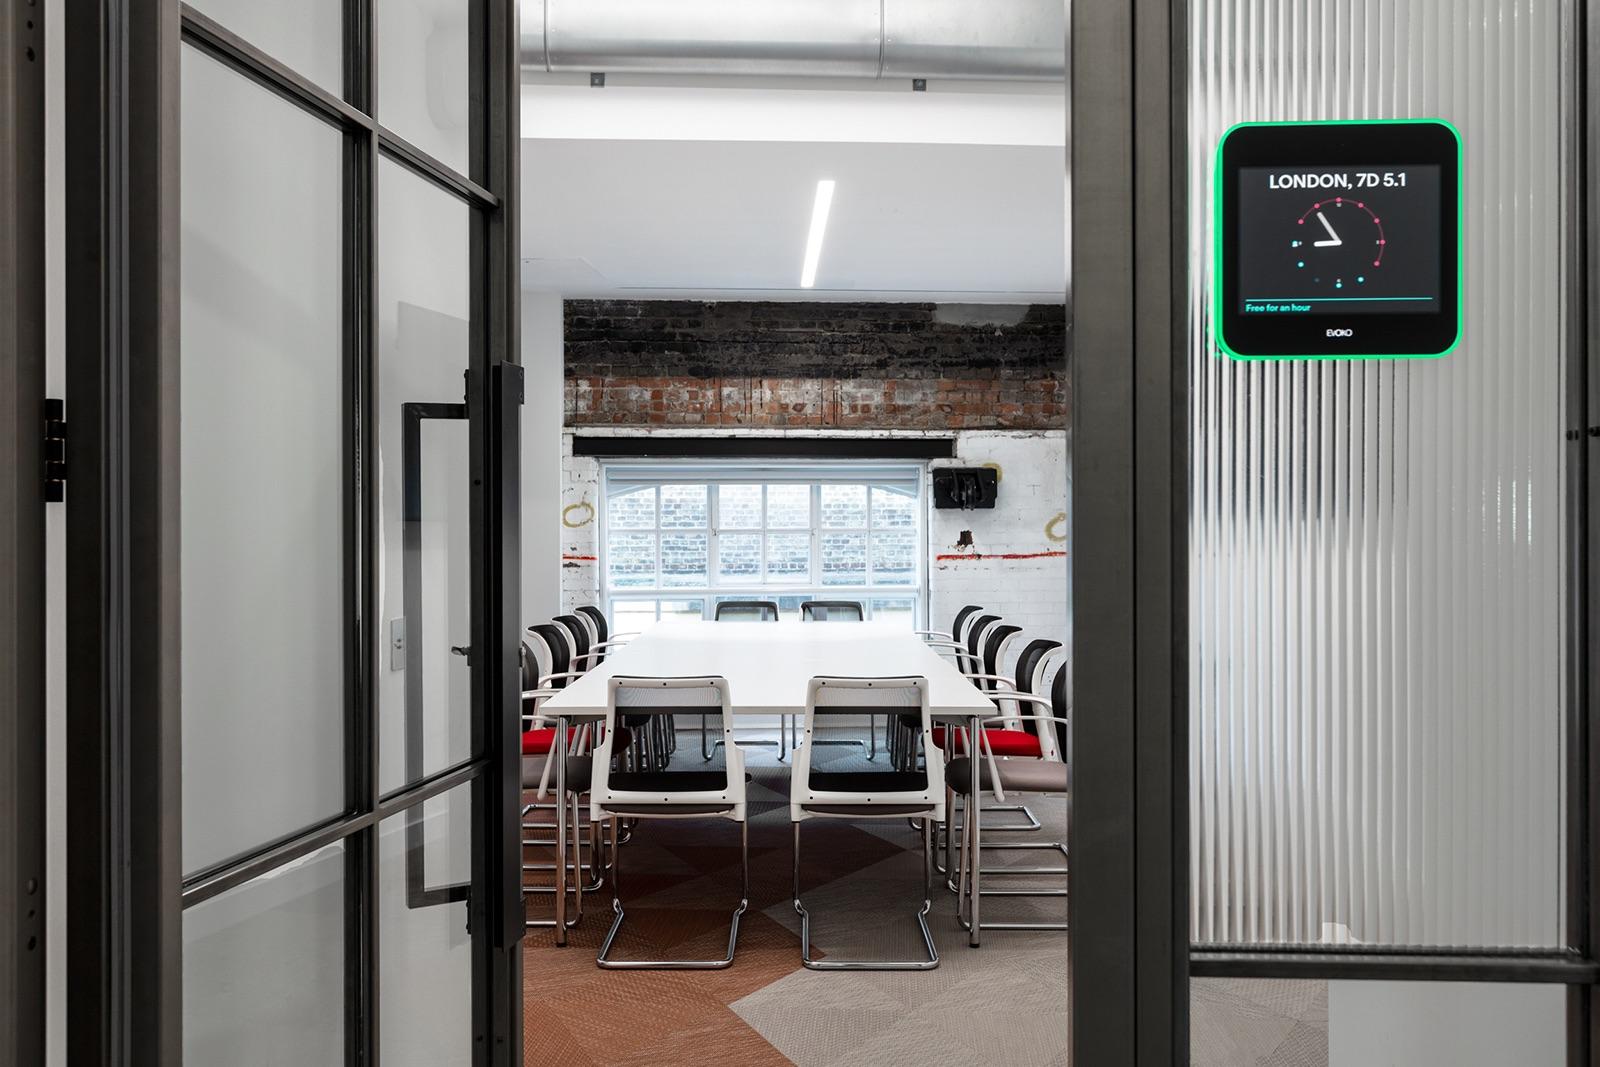 redbull-london-office-2